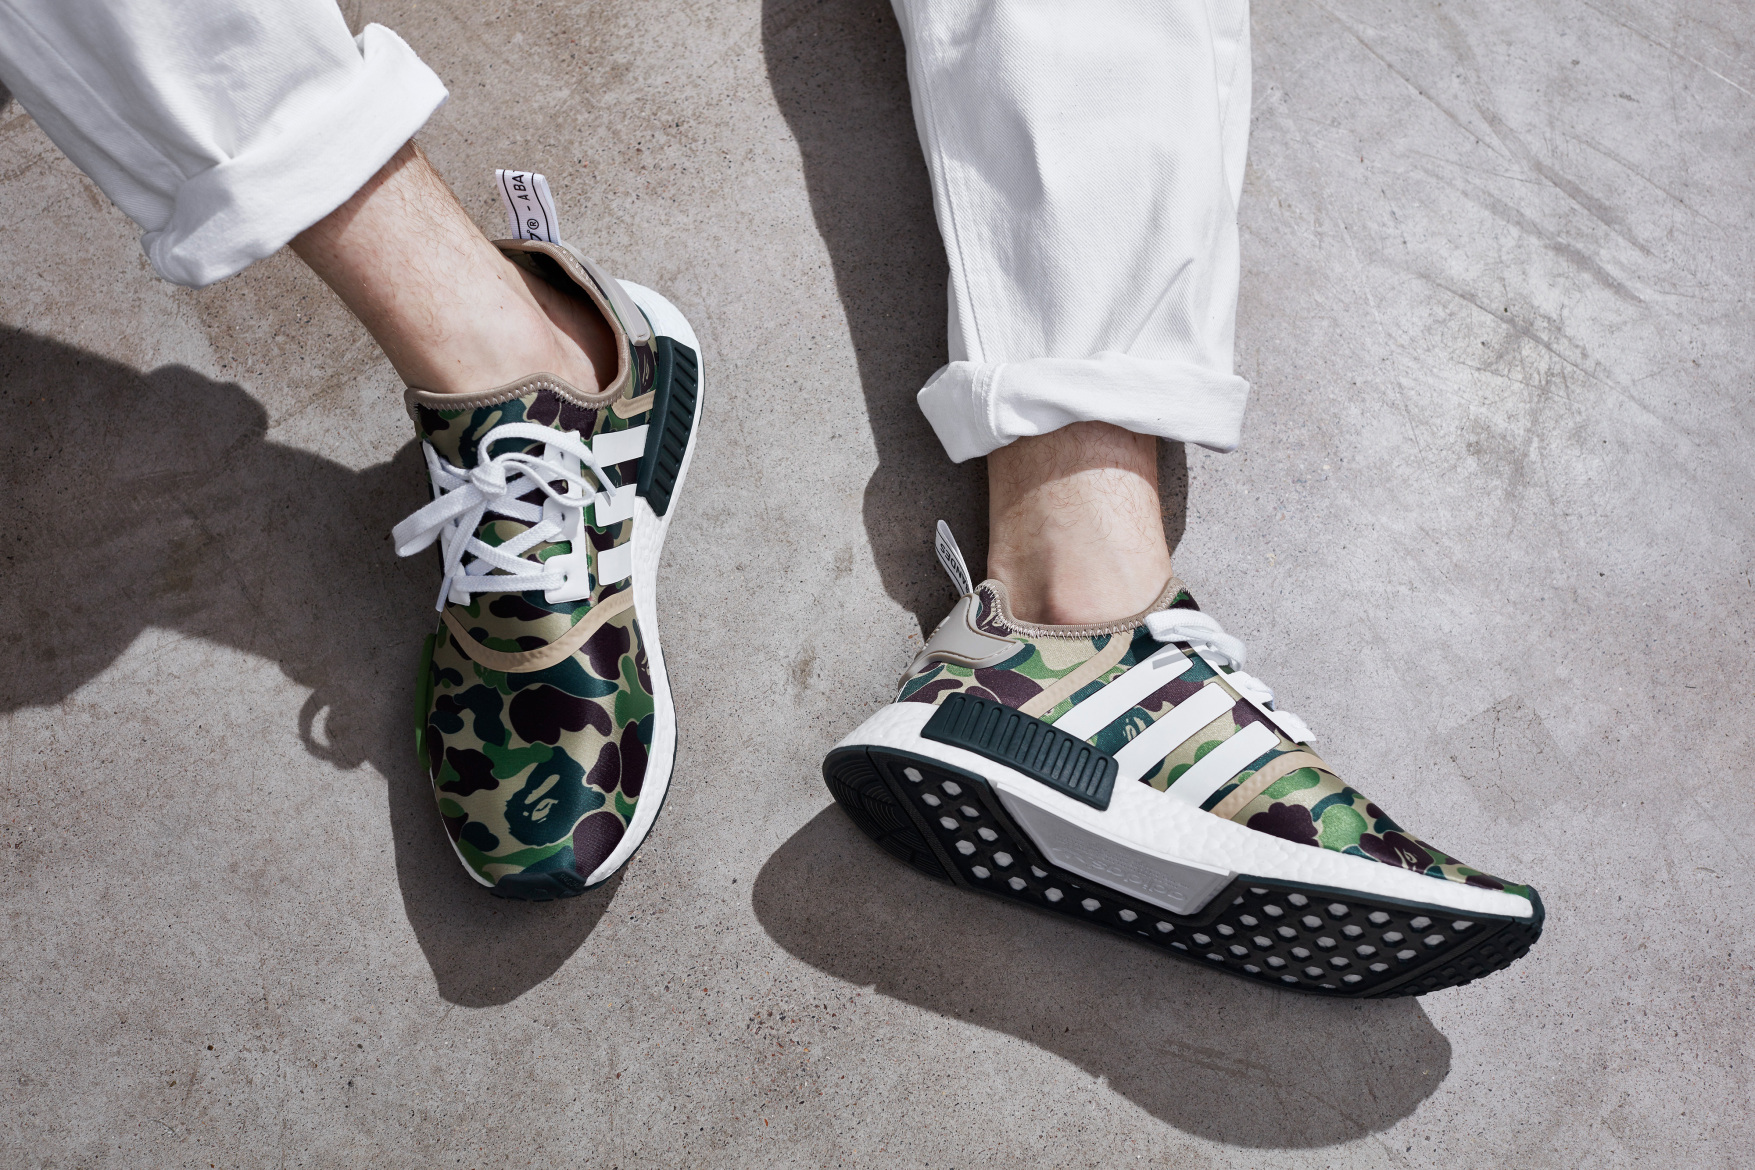 La adidas Originals NMD x A Bathing Ape : la pépite de la collab'